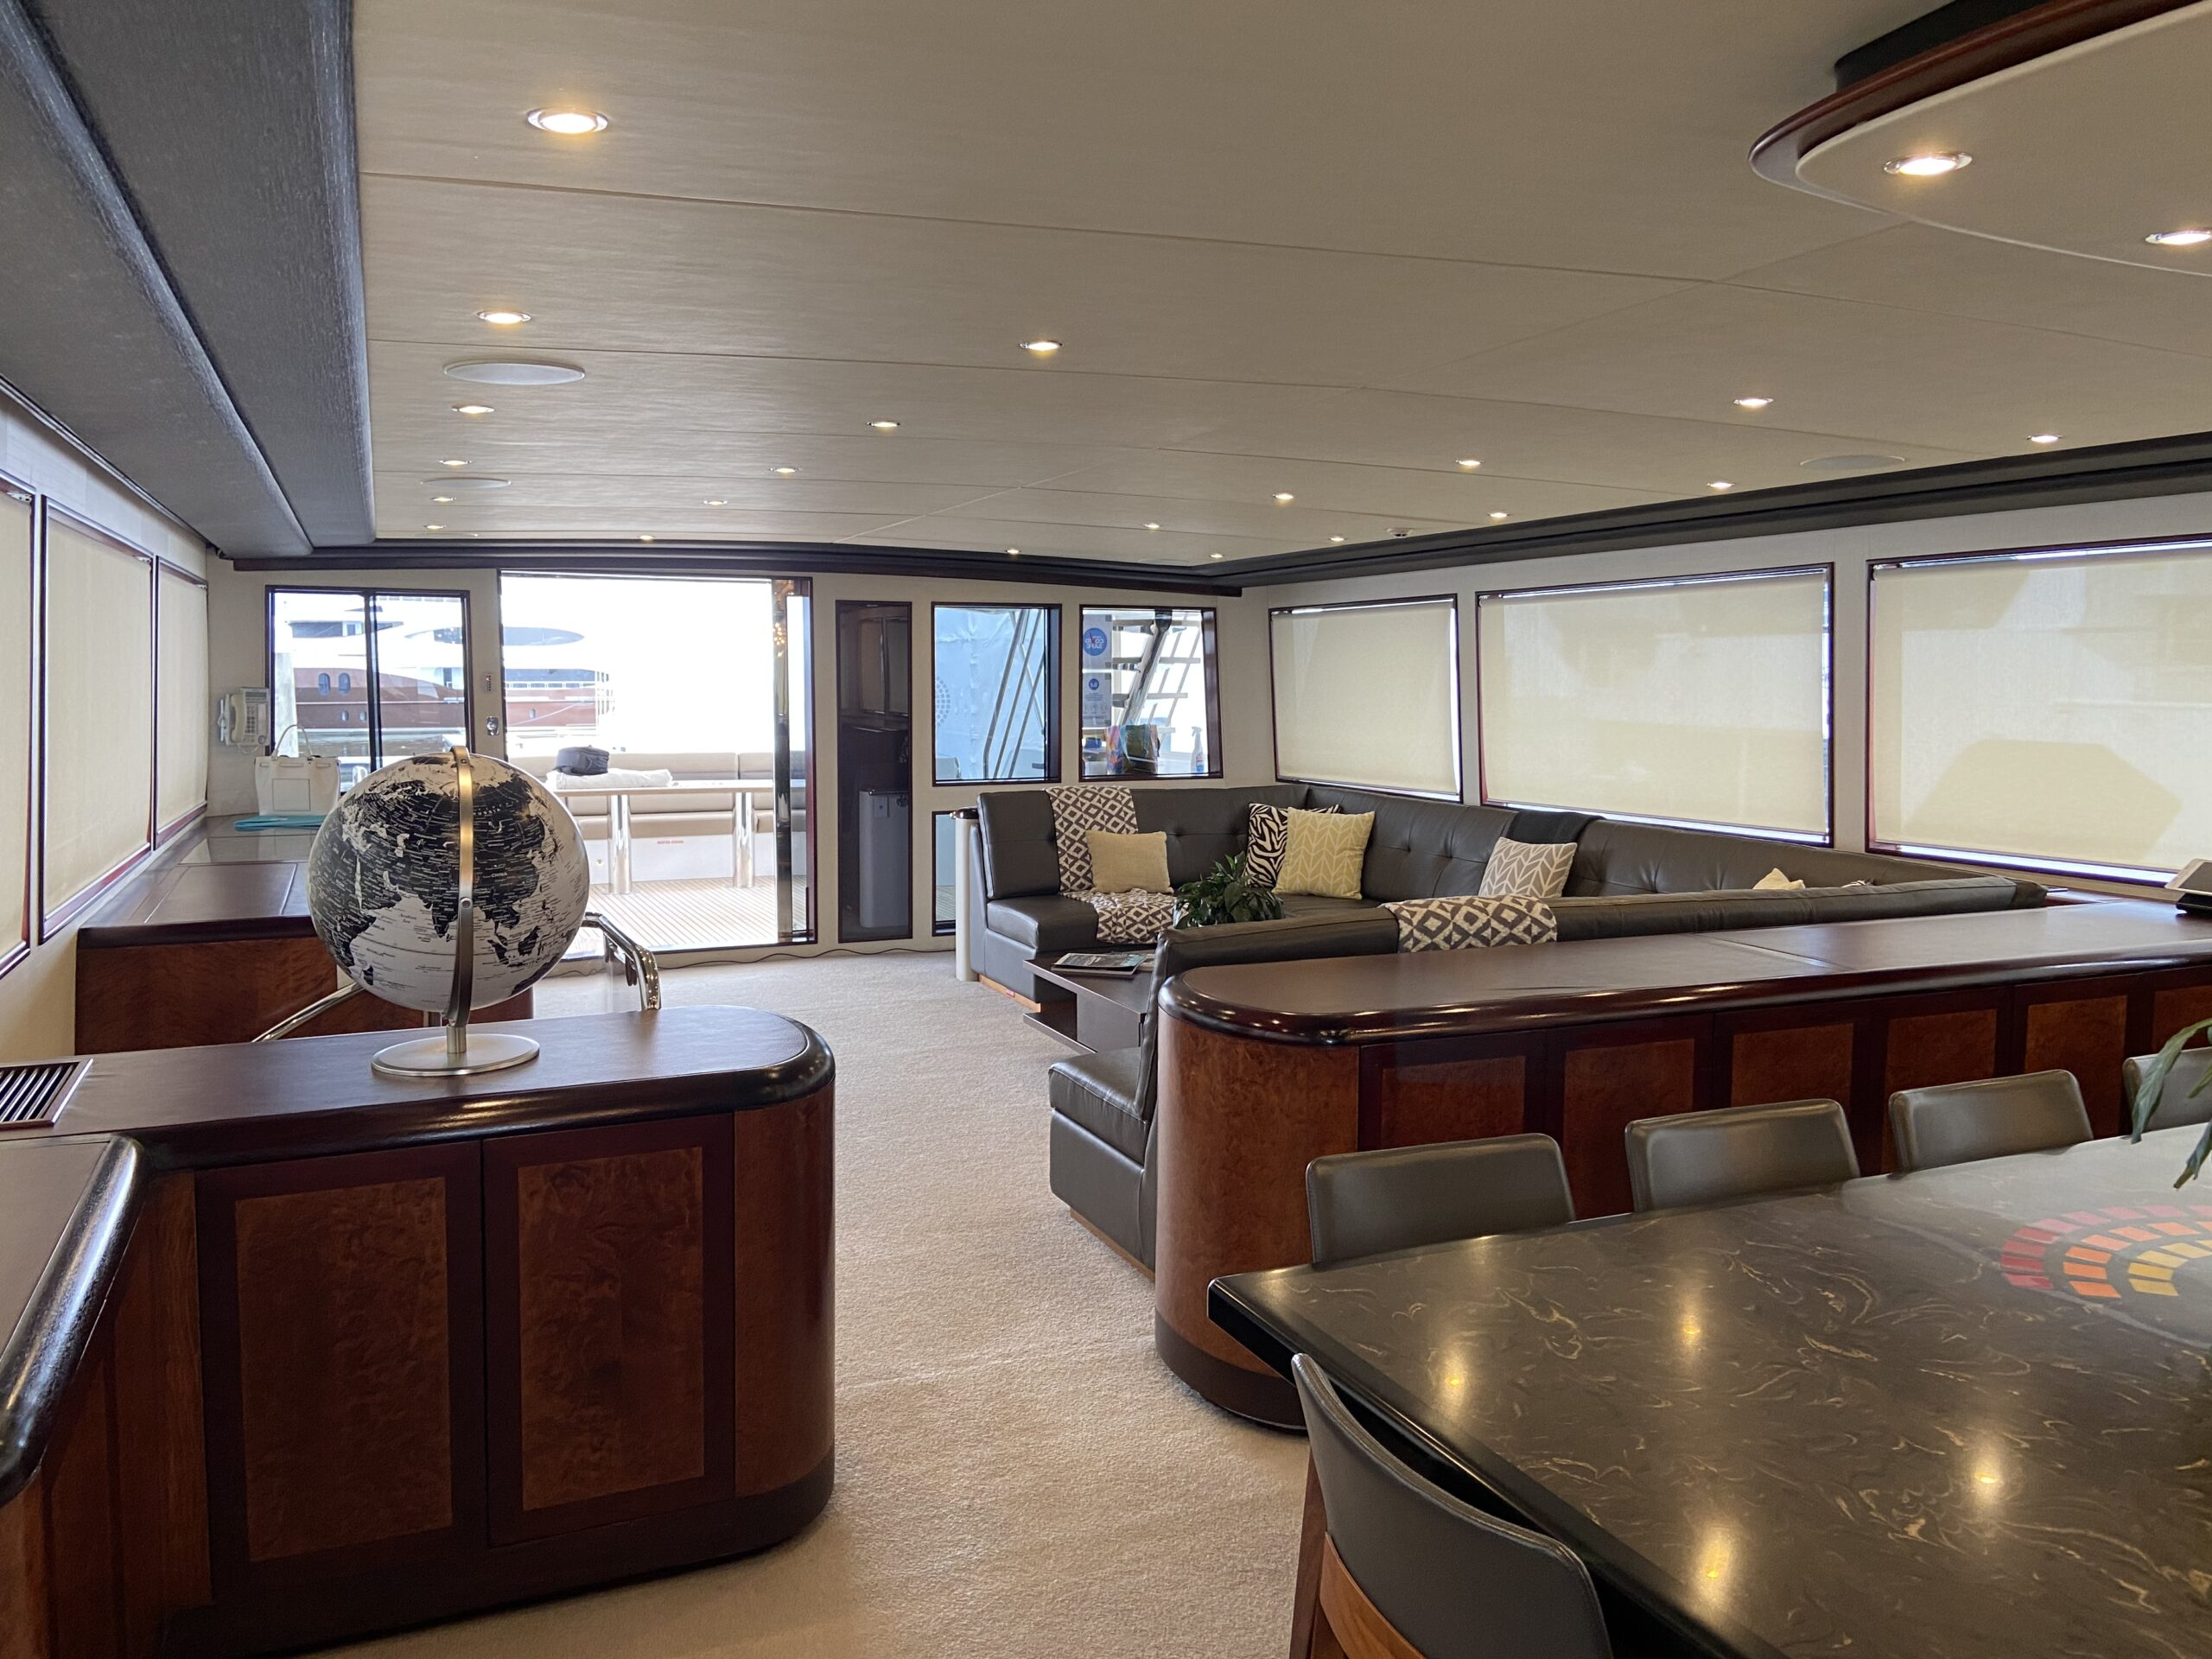 YOTSPACE superyacht voyages - Superyacht expeditions - Corroboree